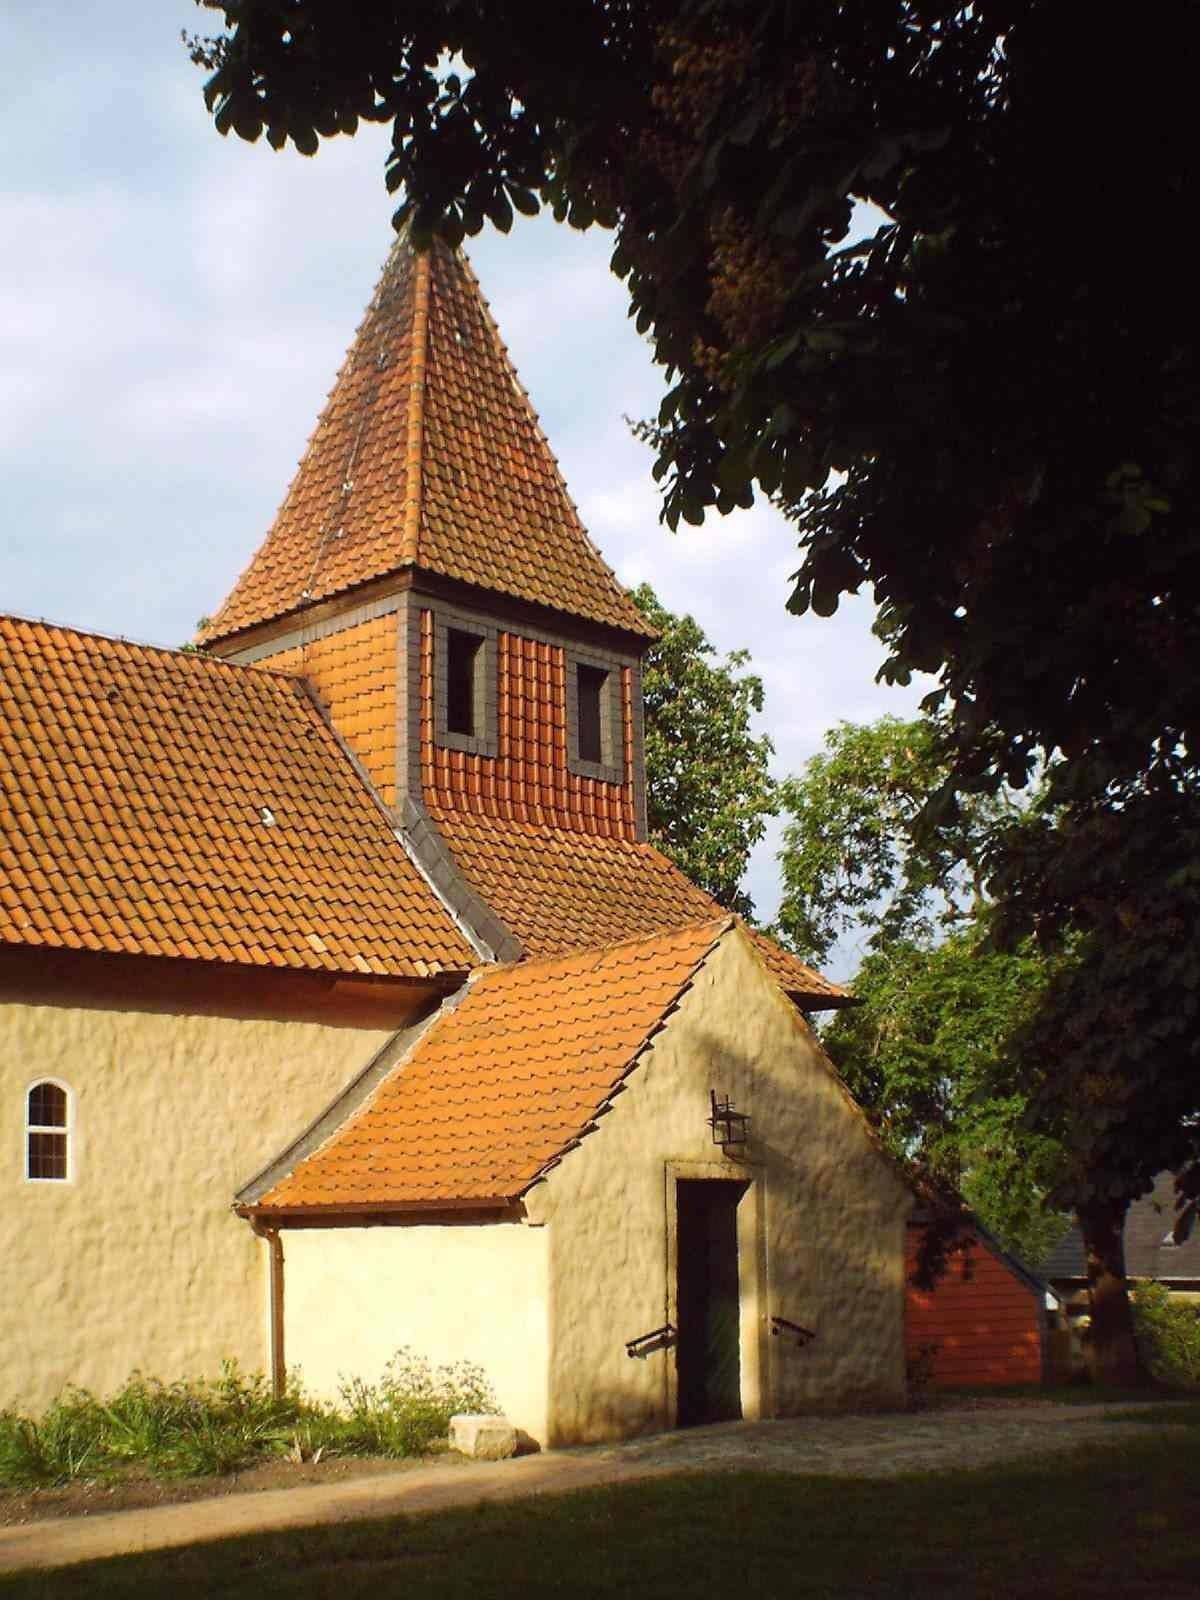 Kirche Wettmershagen